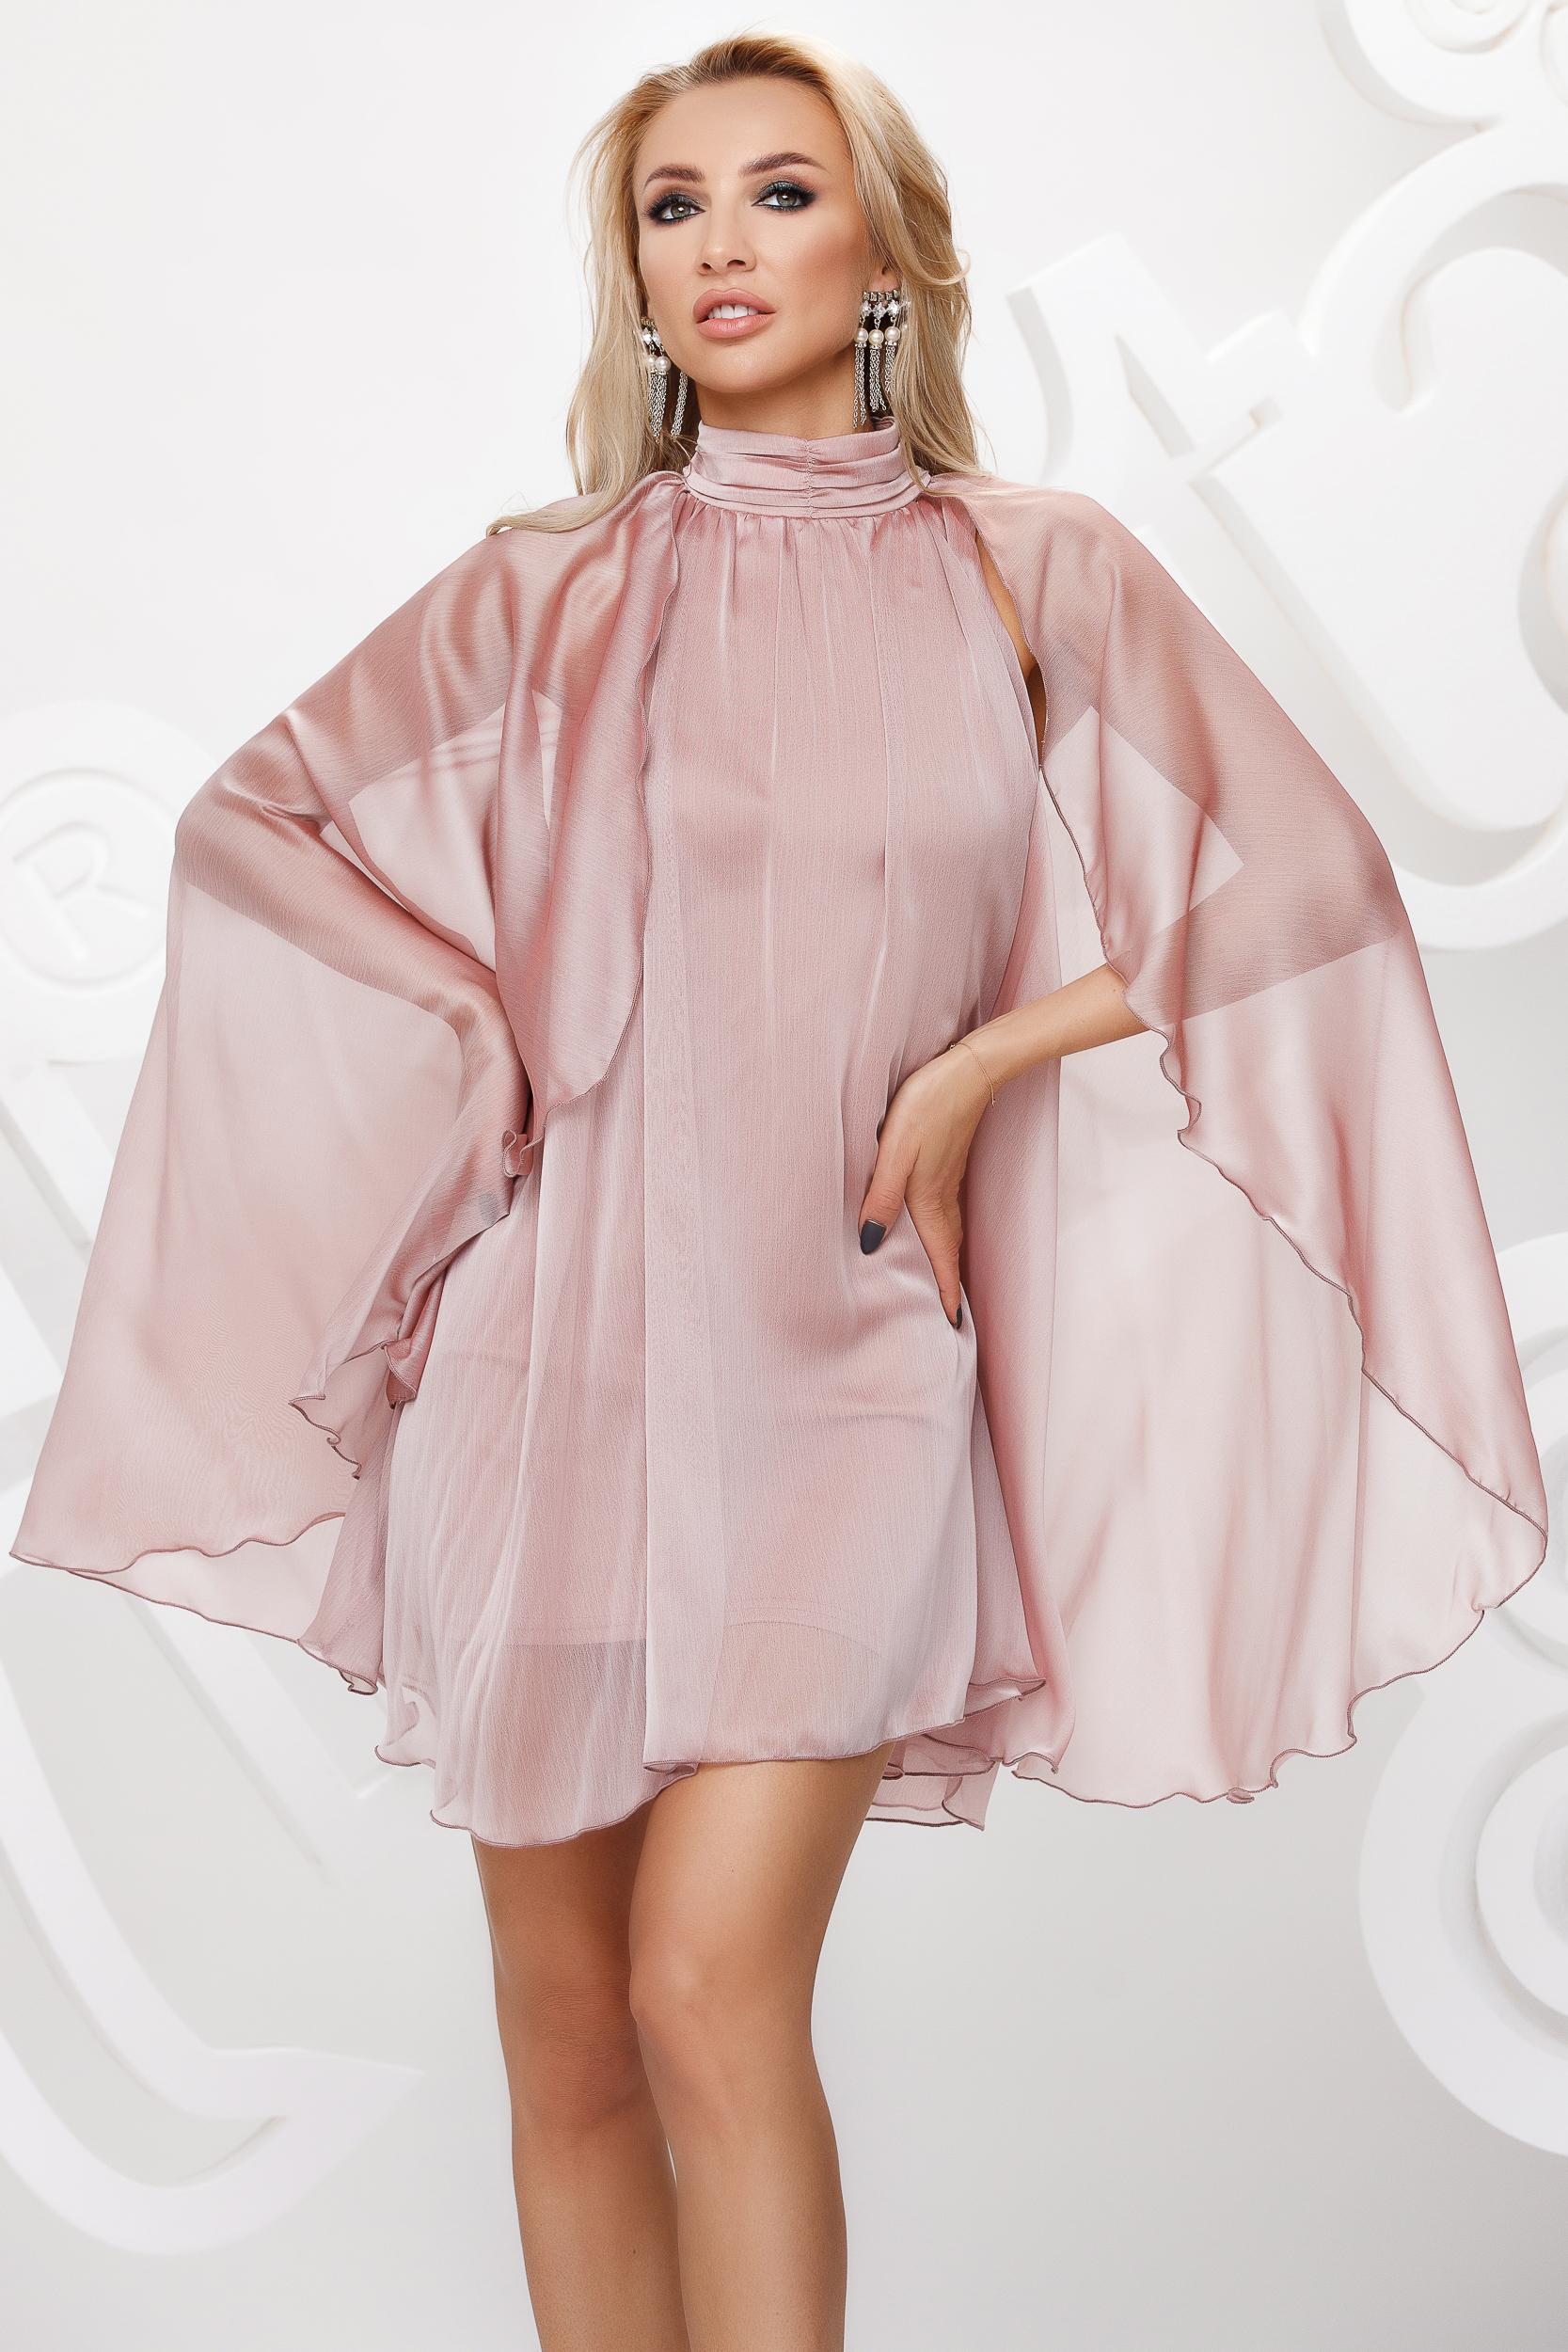 Rochie Artista roz deschis scurta de ocazie din voal pe gat